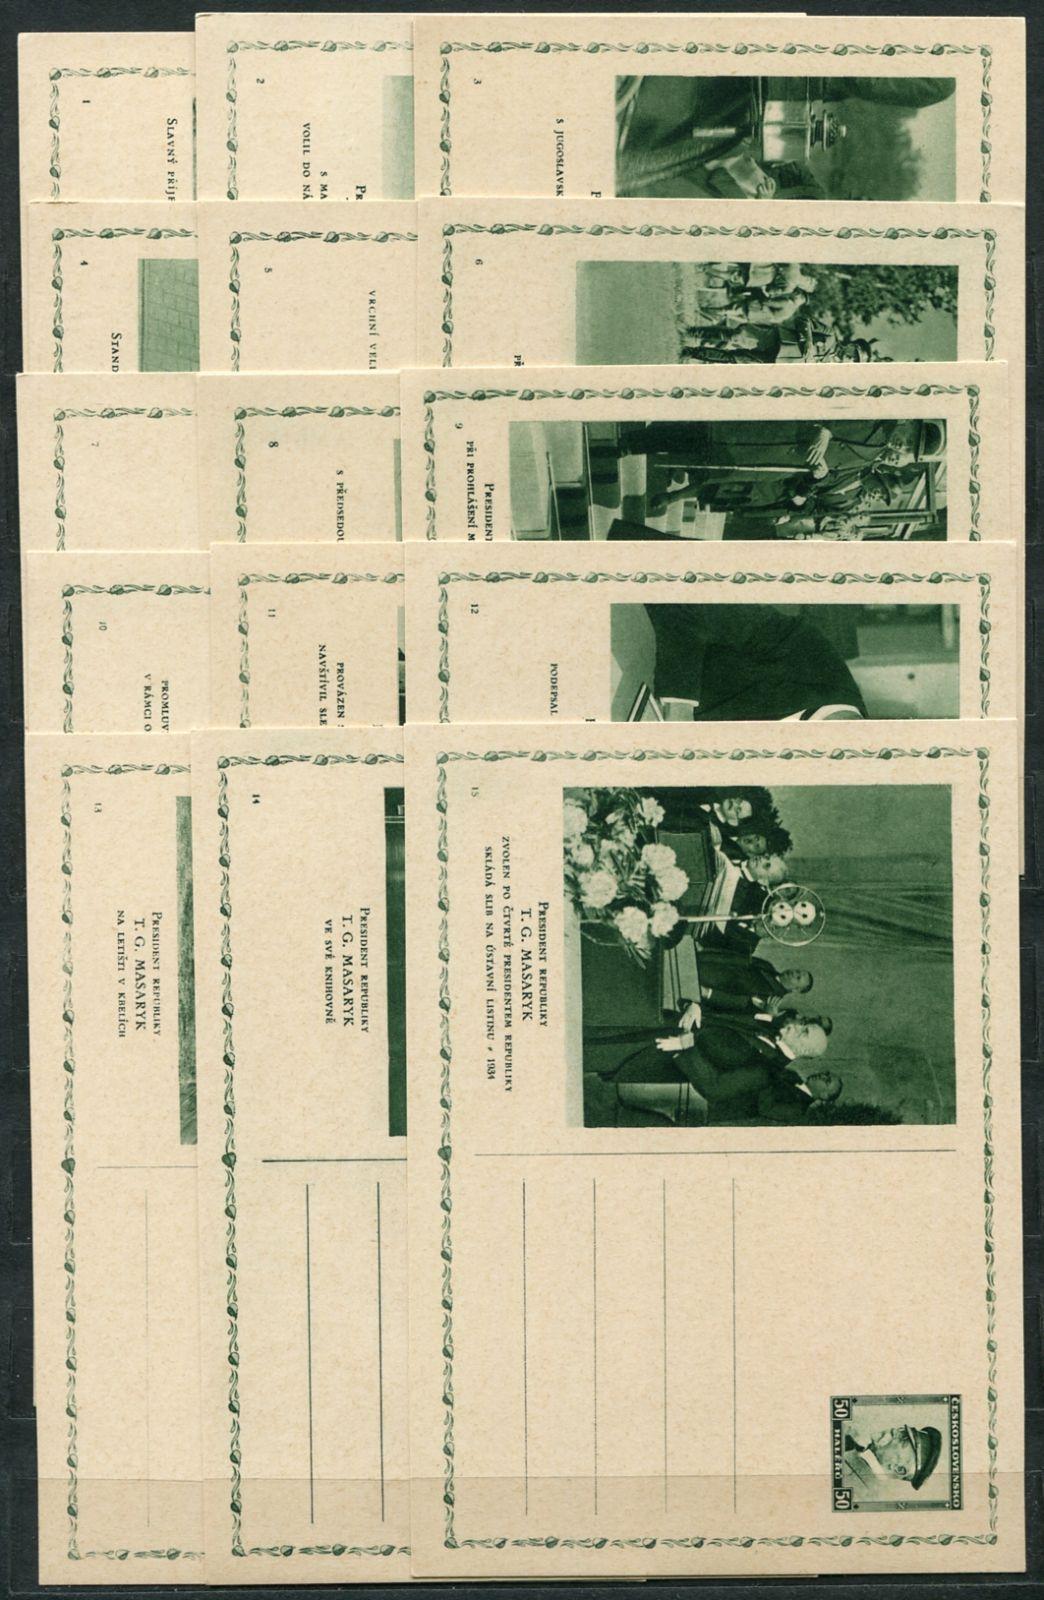 (1936) CDV 60 ** - (1-20) Ze života prezidenta Masaryka